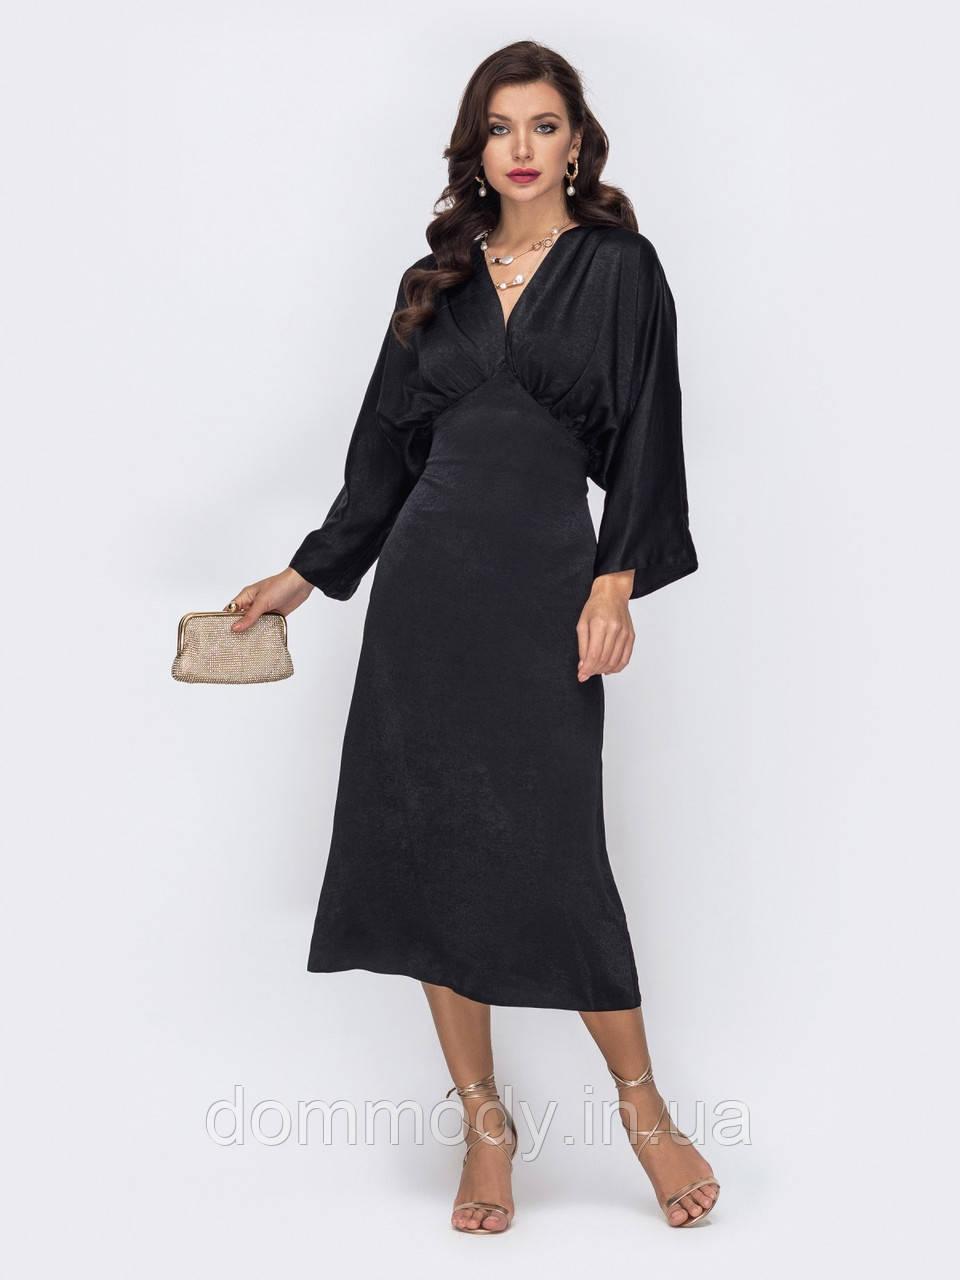 Платье женское Shannon black